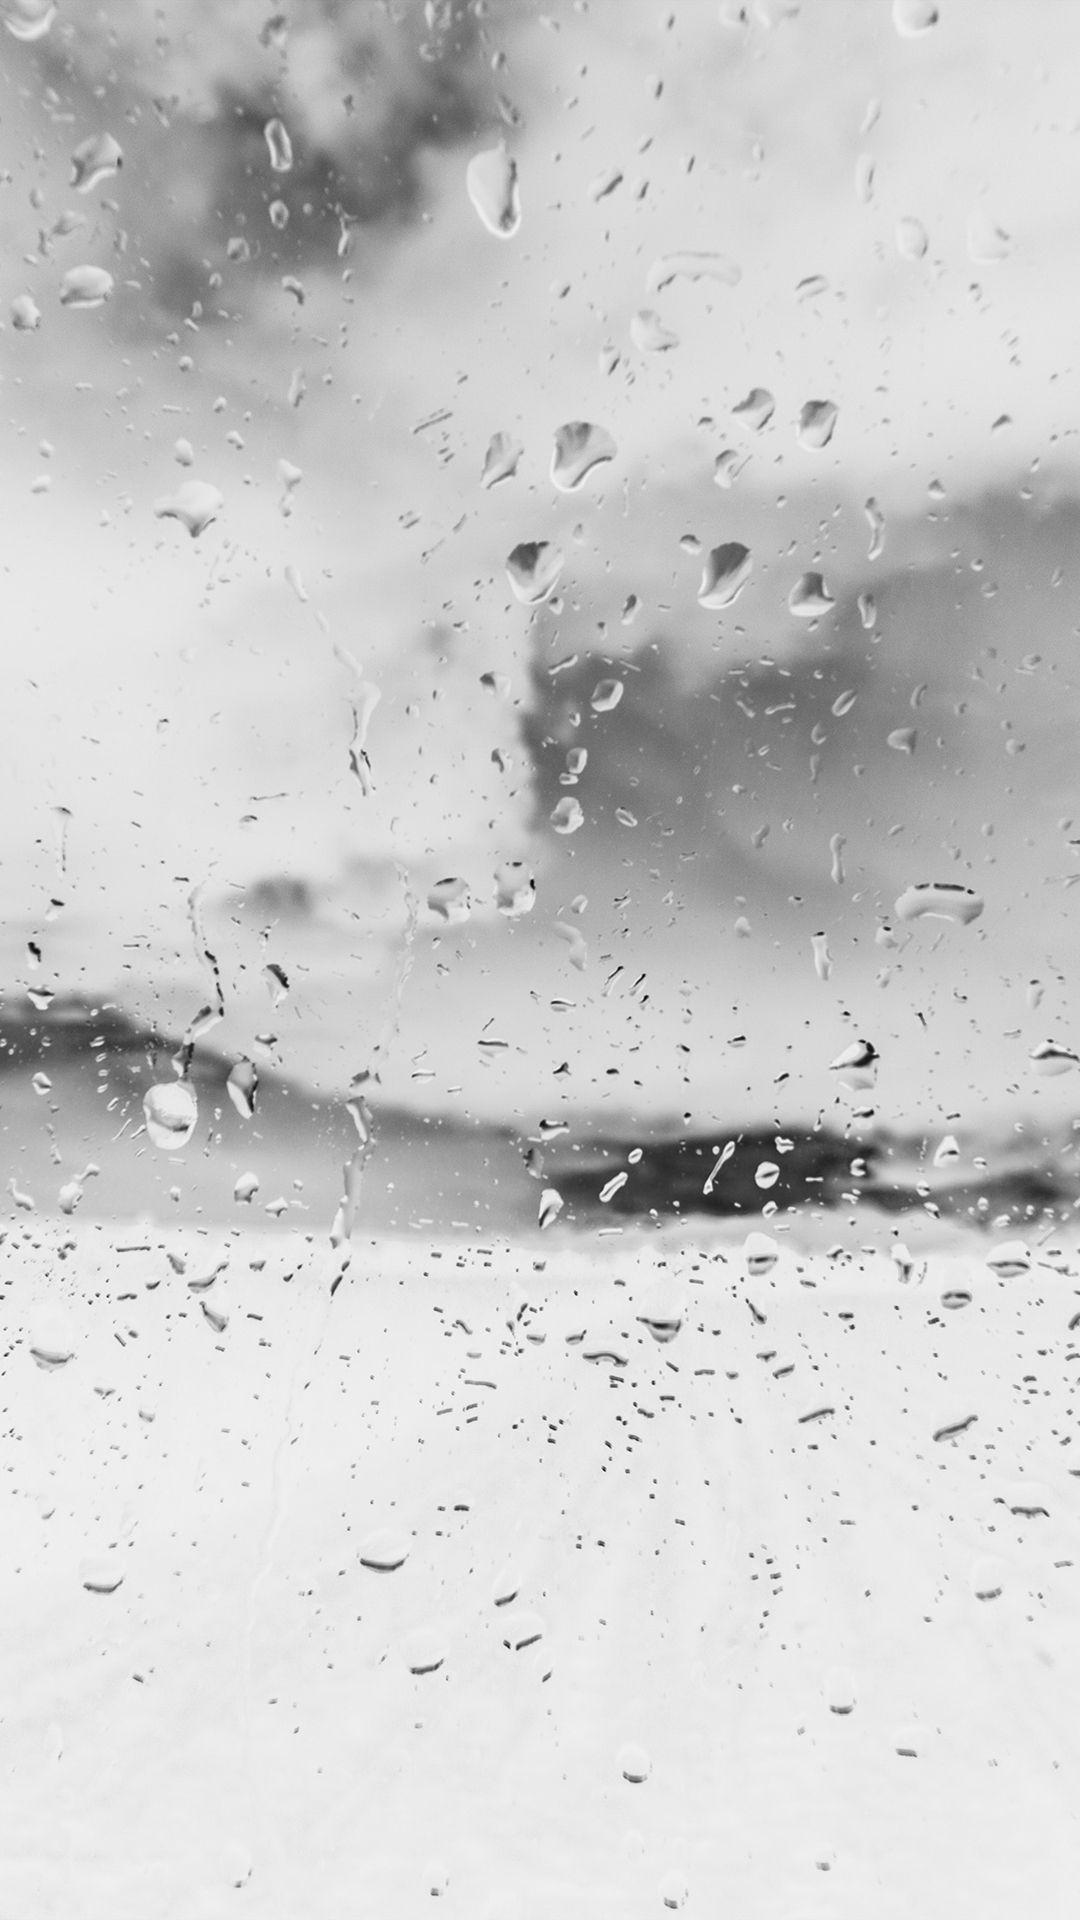 Rainy Window Nature Water Drop Road White Iphone 6 Wallpaper Download Iphone Wallpapers Ipad Wallpapers One Nature Water Rainy Wallpaper Iphone 4s Wallpaper